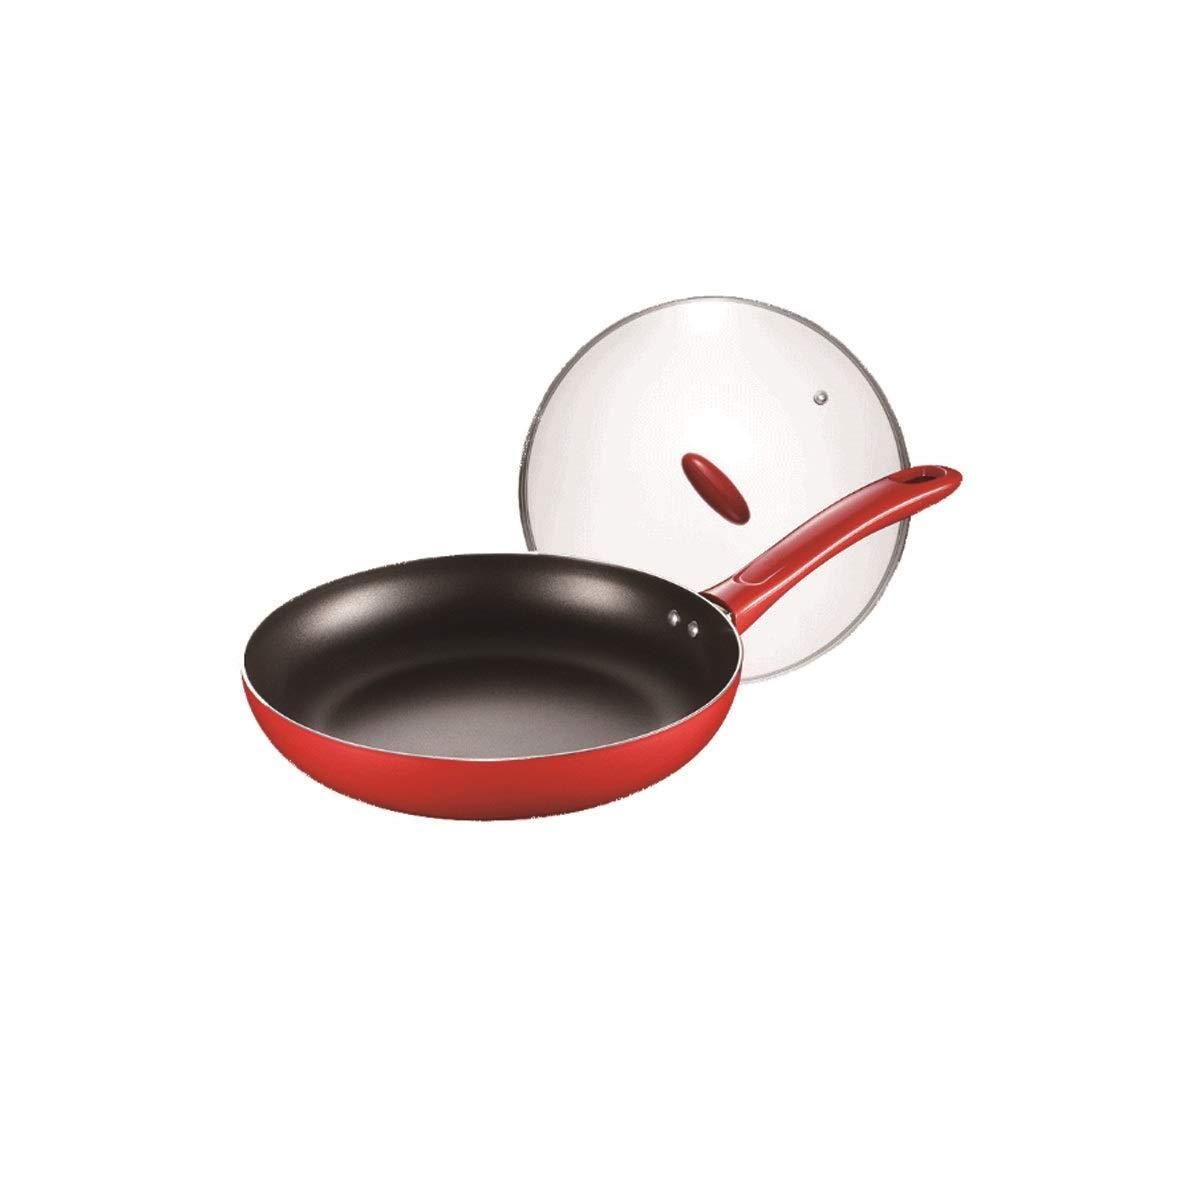 Hengtongtongxun Maifan Stone Steak Pot, Striped Frying Steak Special Pan, Non-Stick Frying Pan, Strong and Sturdy (Size : Maifan 26cm)